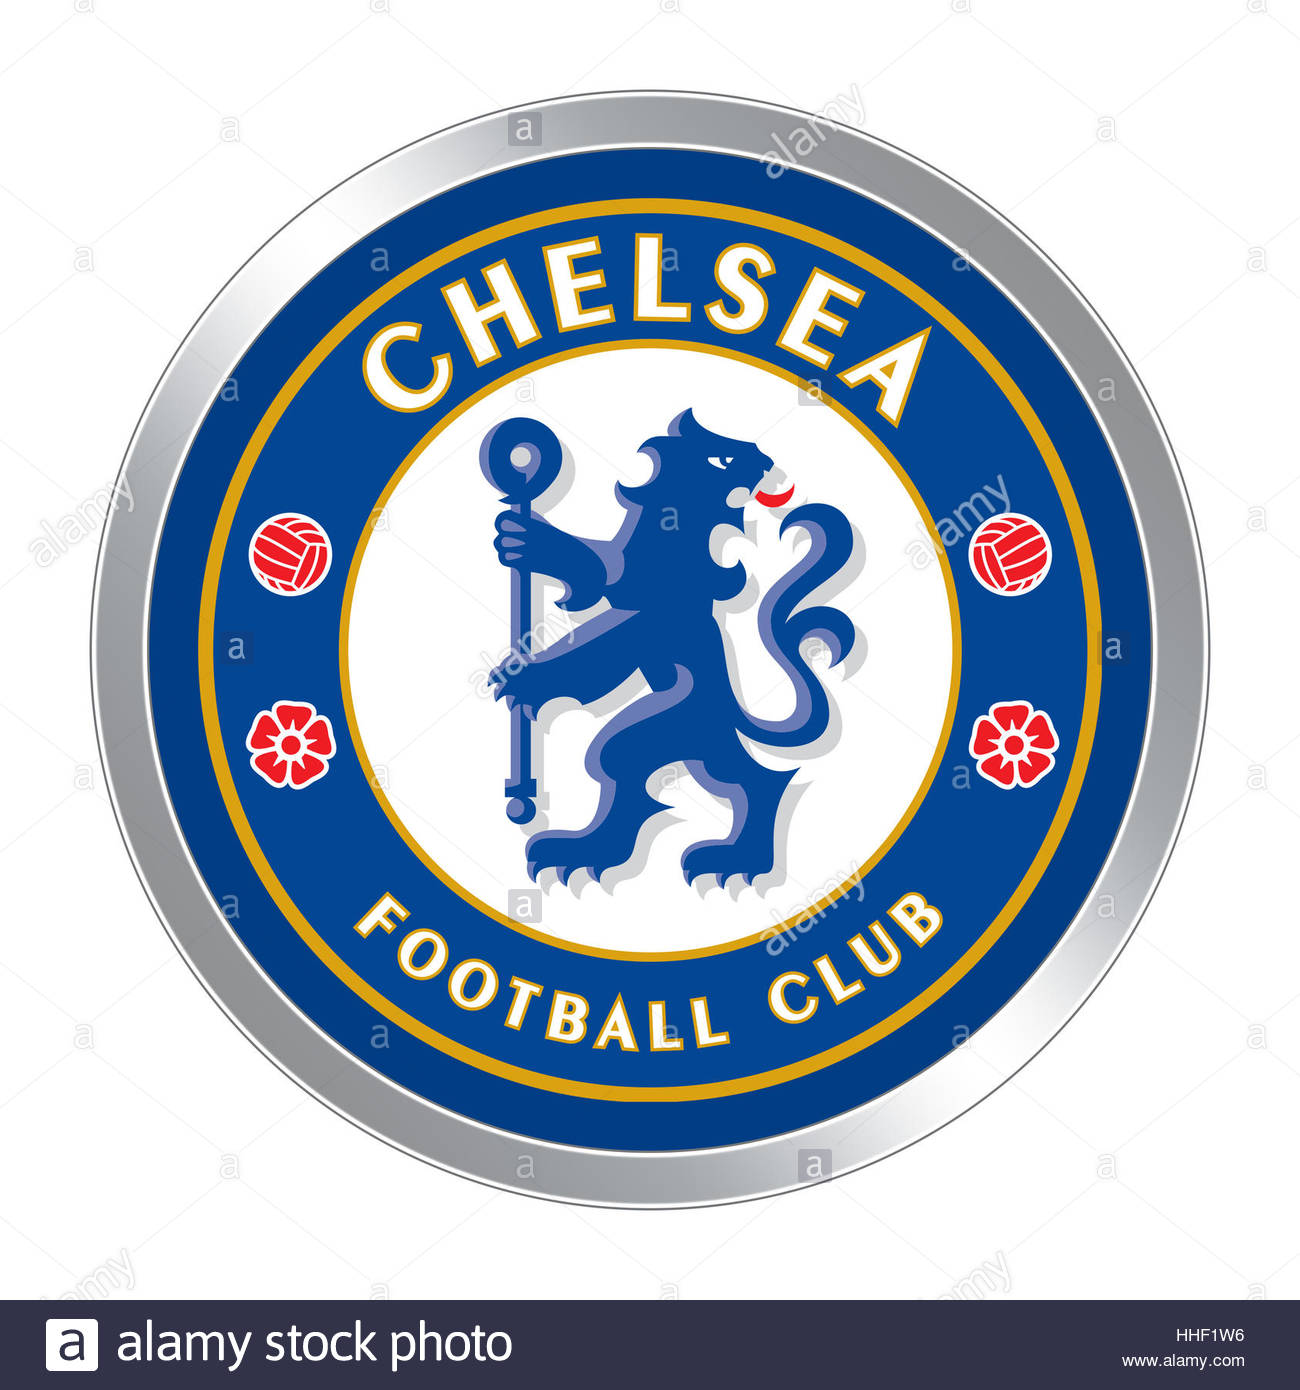 Chelsea Fc Logo Stock Photos   Chelsea Fc Logo Stock Images - Alamy 8eadd1fa0